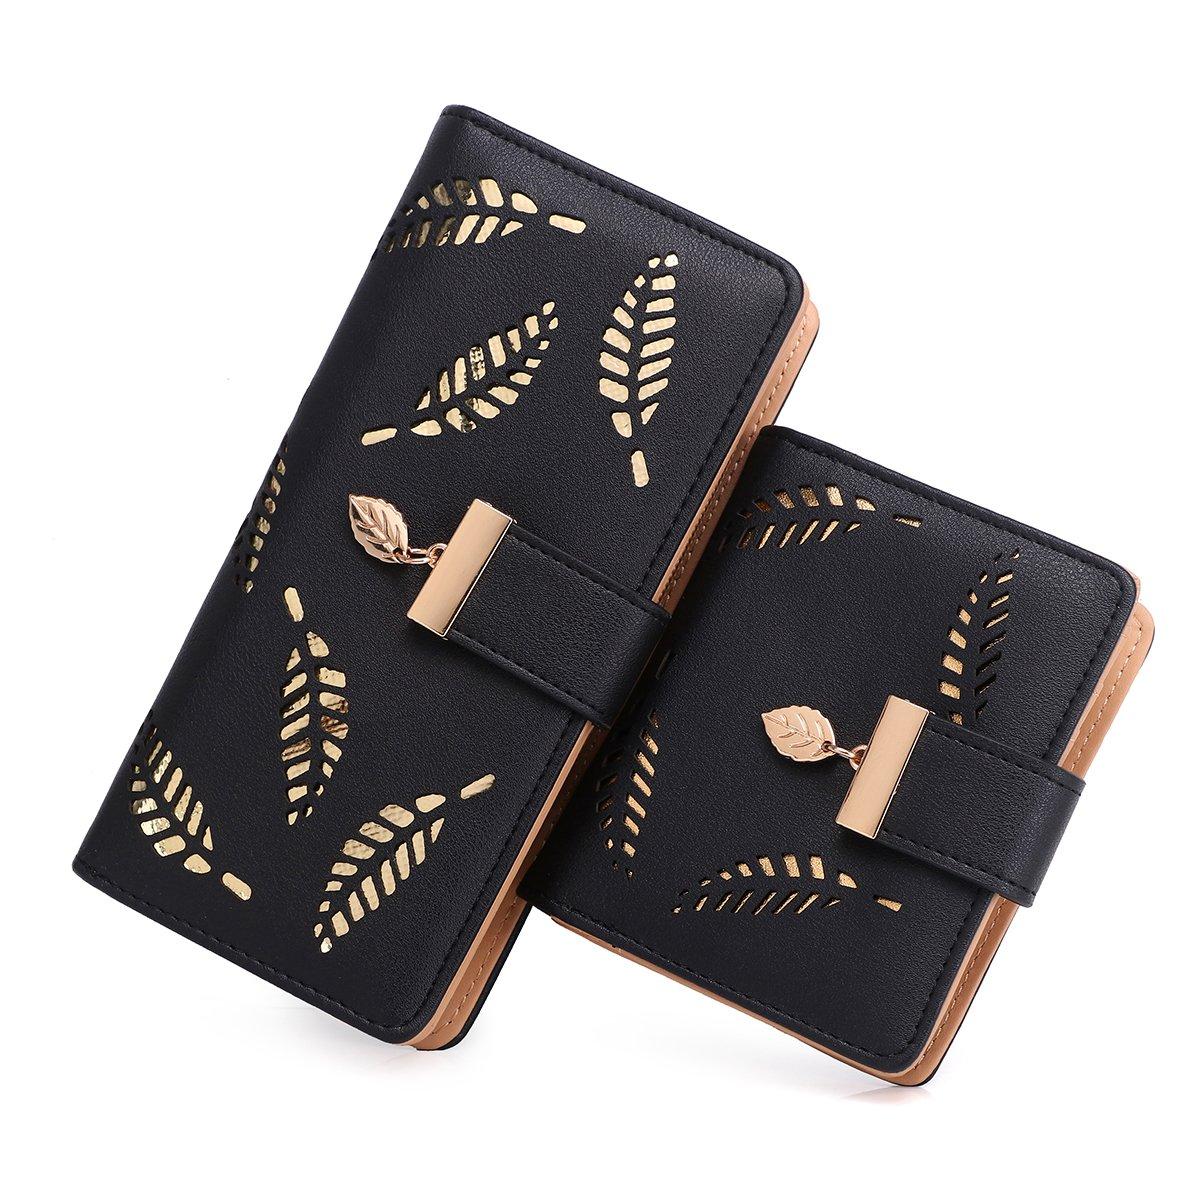 Women's Long short Leather Money Clip Card Case Holder Purse Zipper Buckle Elegant Clutch Wallet(pair) (Black)